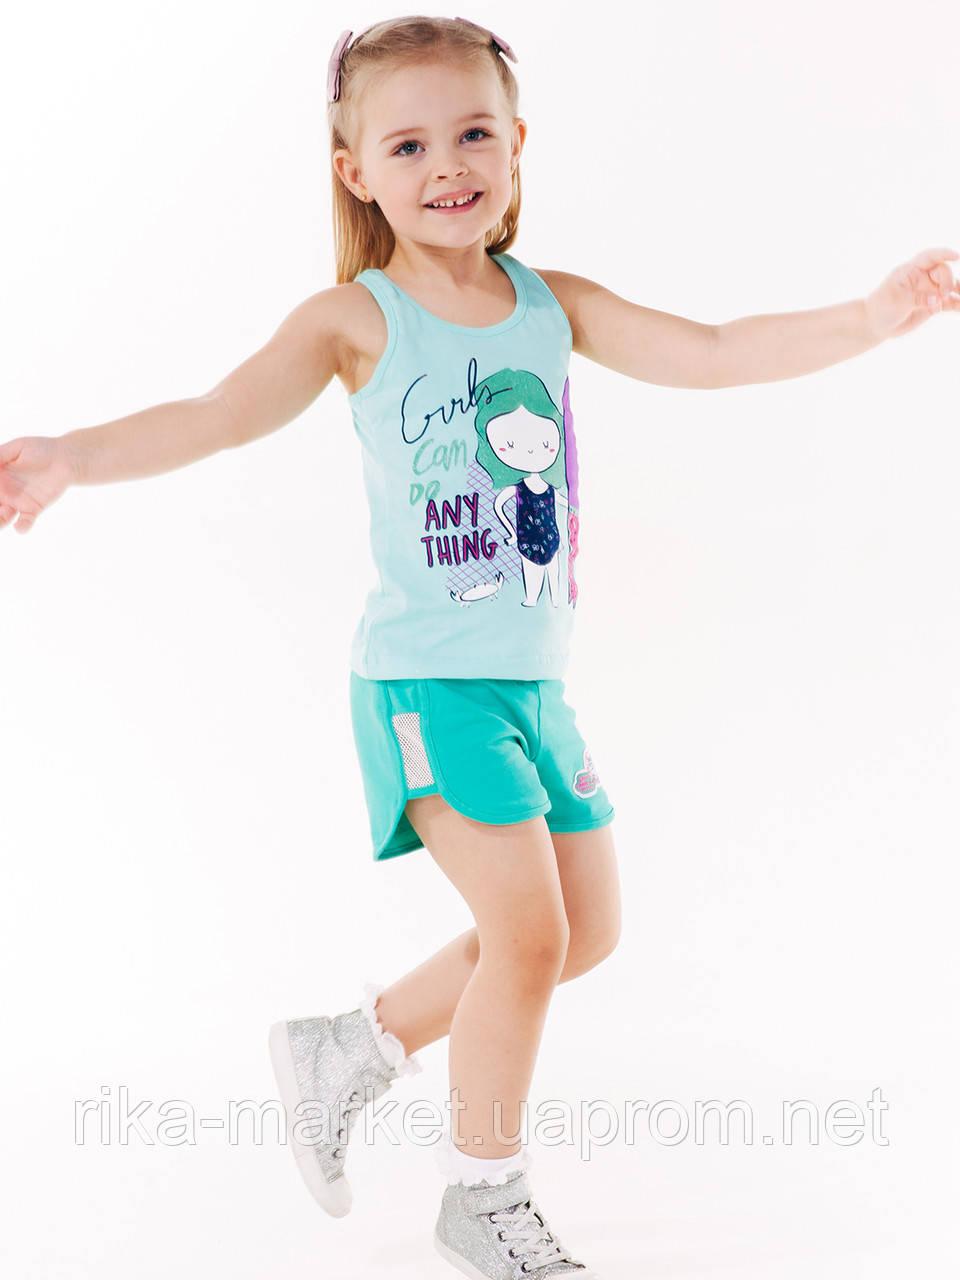 Майка для девочки ТМ Смил арт. 110511, возраст от 4 до 6 лет